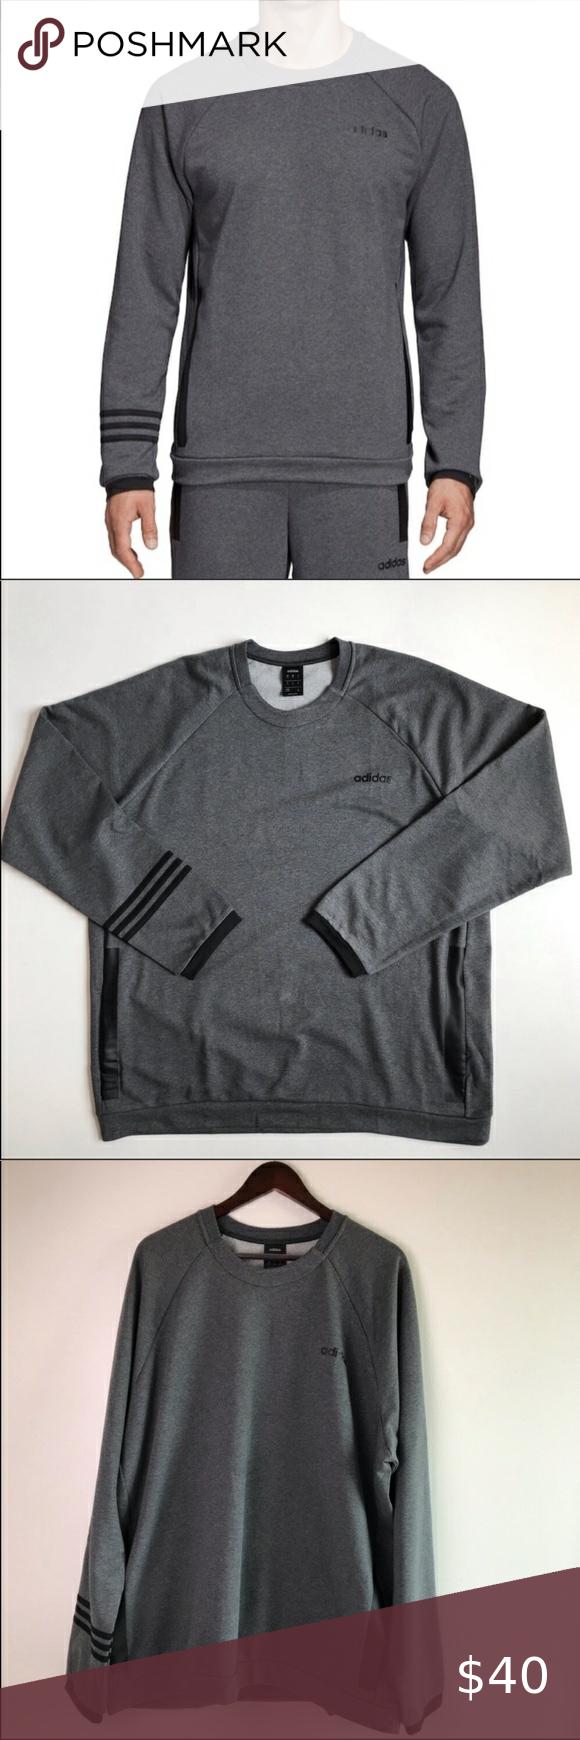 Adidas Climate Sweatshirt Three Stripes Adidas Sweatshirt Heather Gray Crewneck Long Sleeves Side Pockets Sweatshirts Adidas Sweatshirt Adidas Three Stripes [ 1740 x 580 Pixel ]